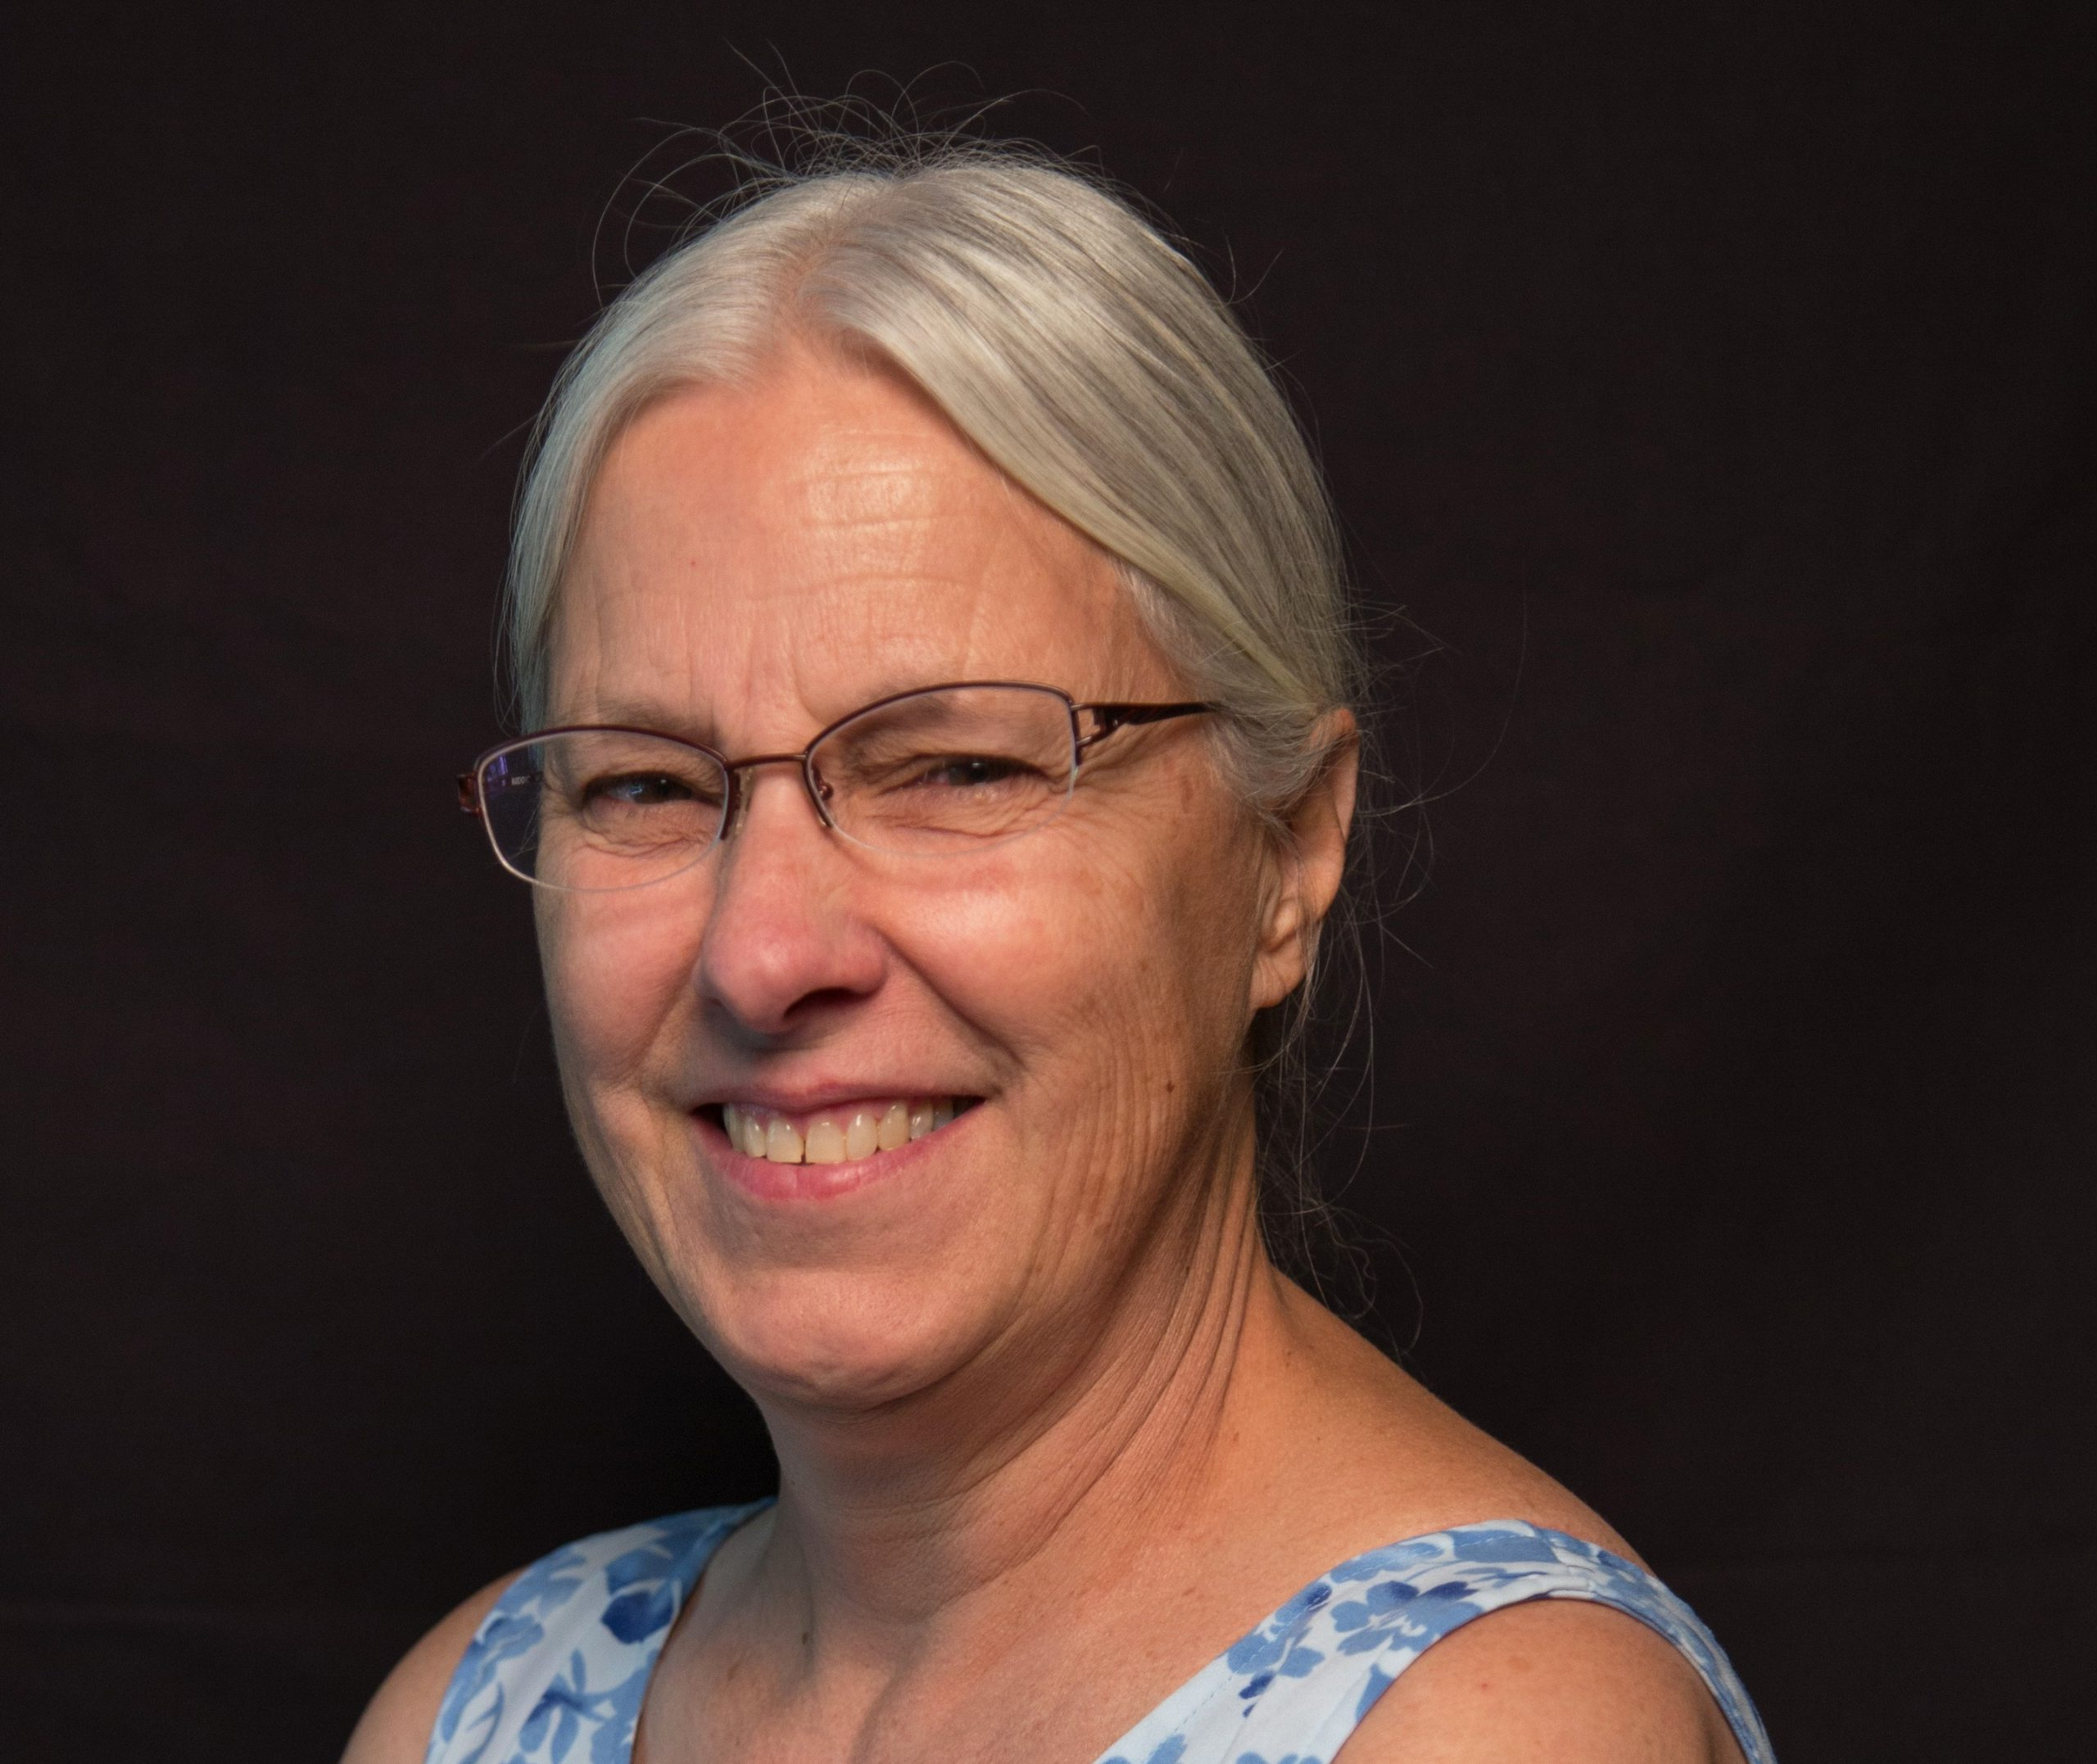 Merrie Rampy, IDSEF Fair Director